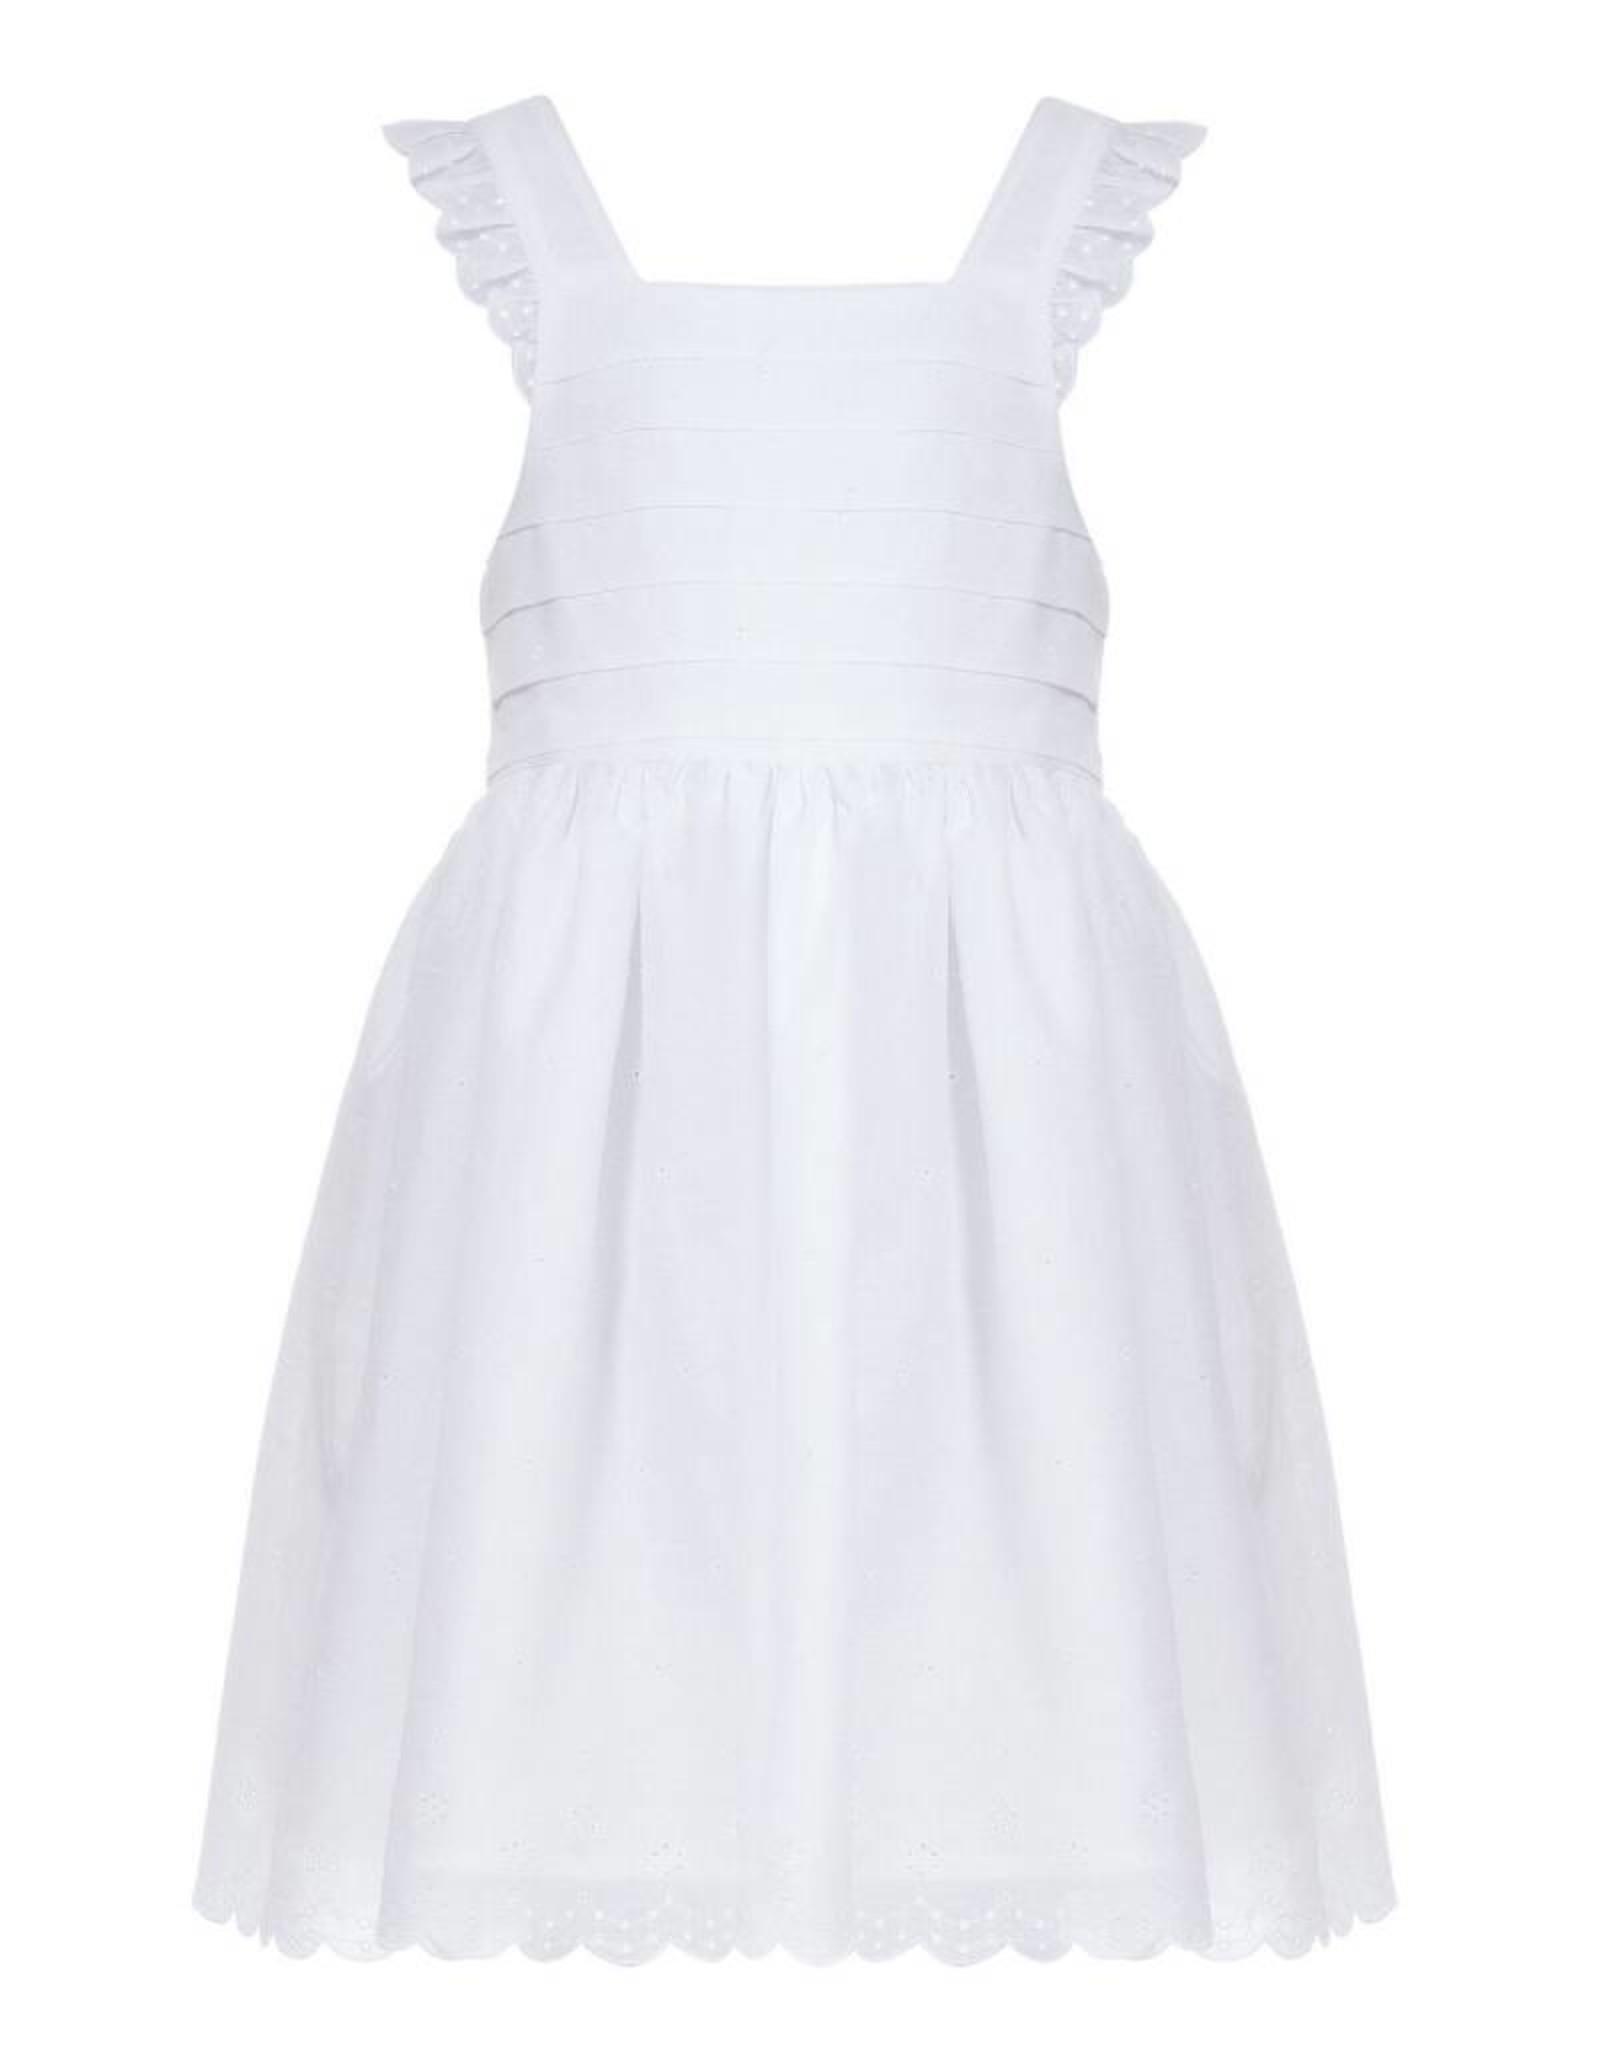 Crossed straps dress